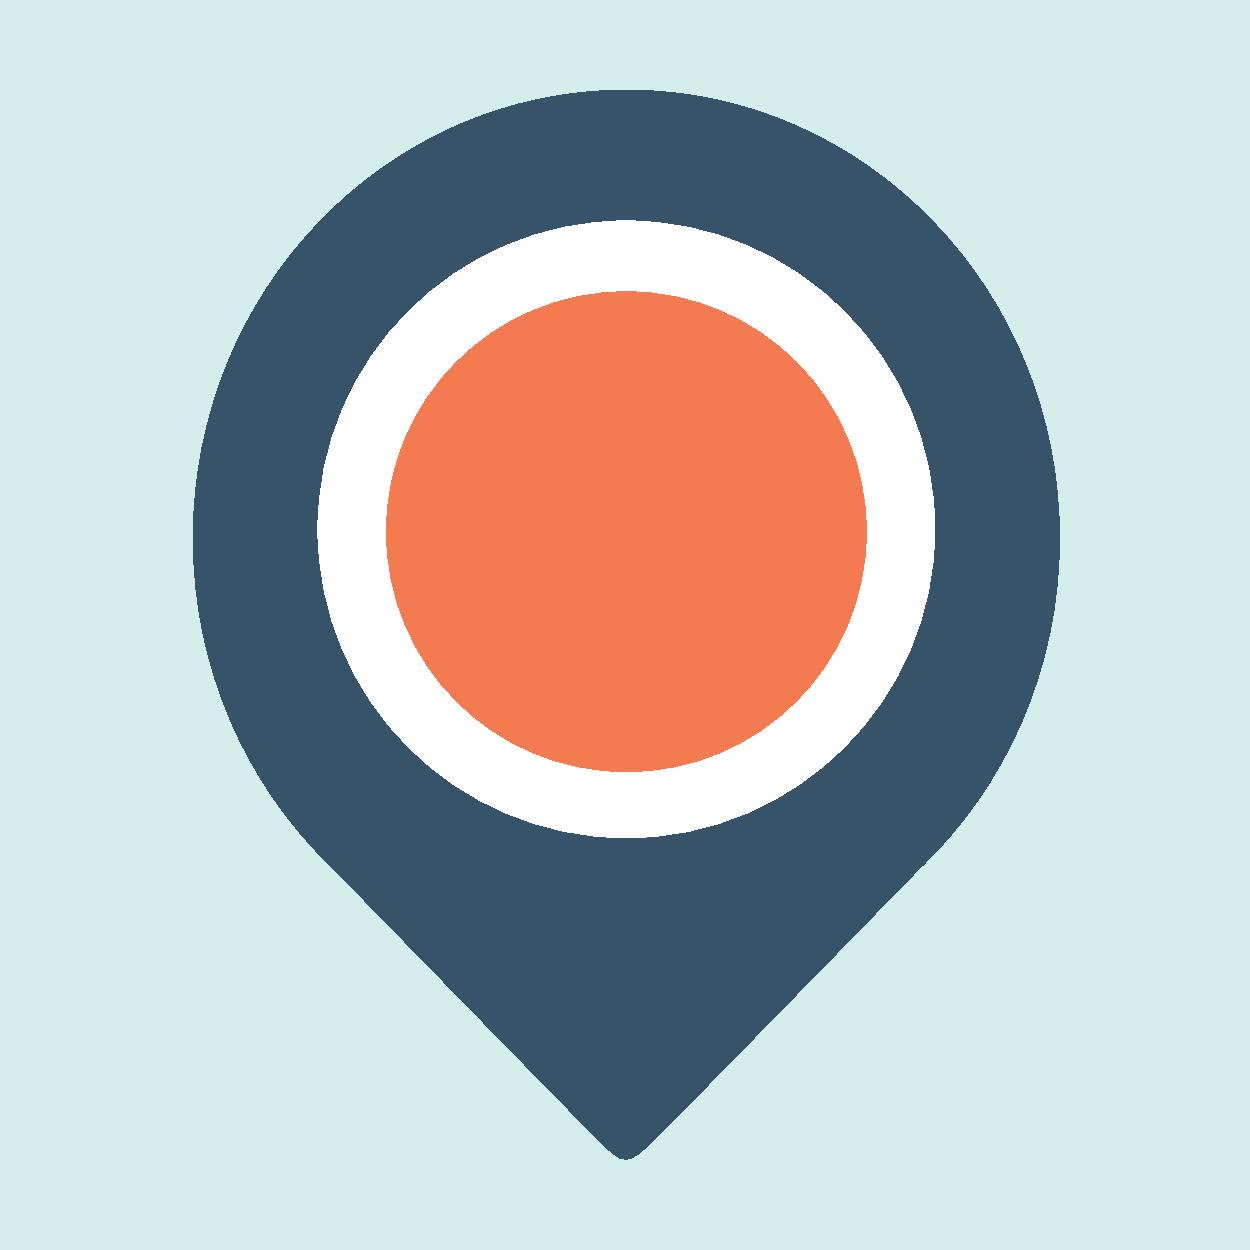 map pin large.png